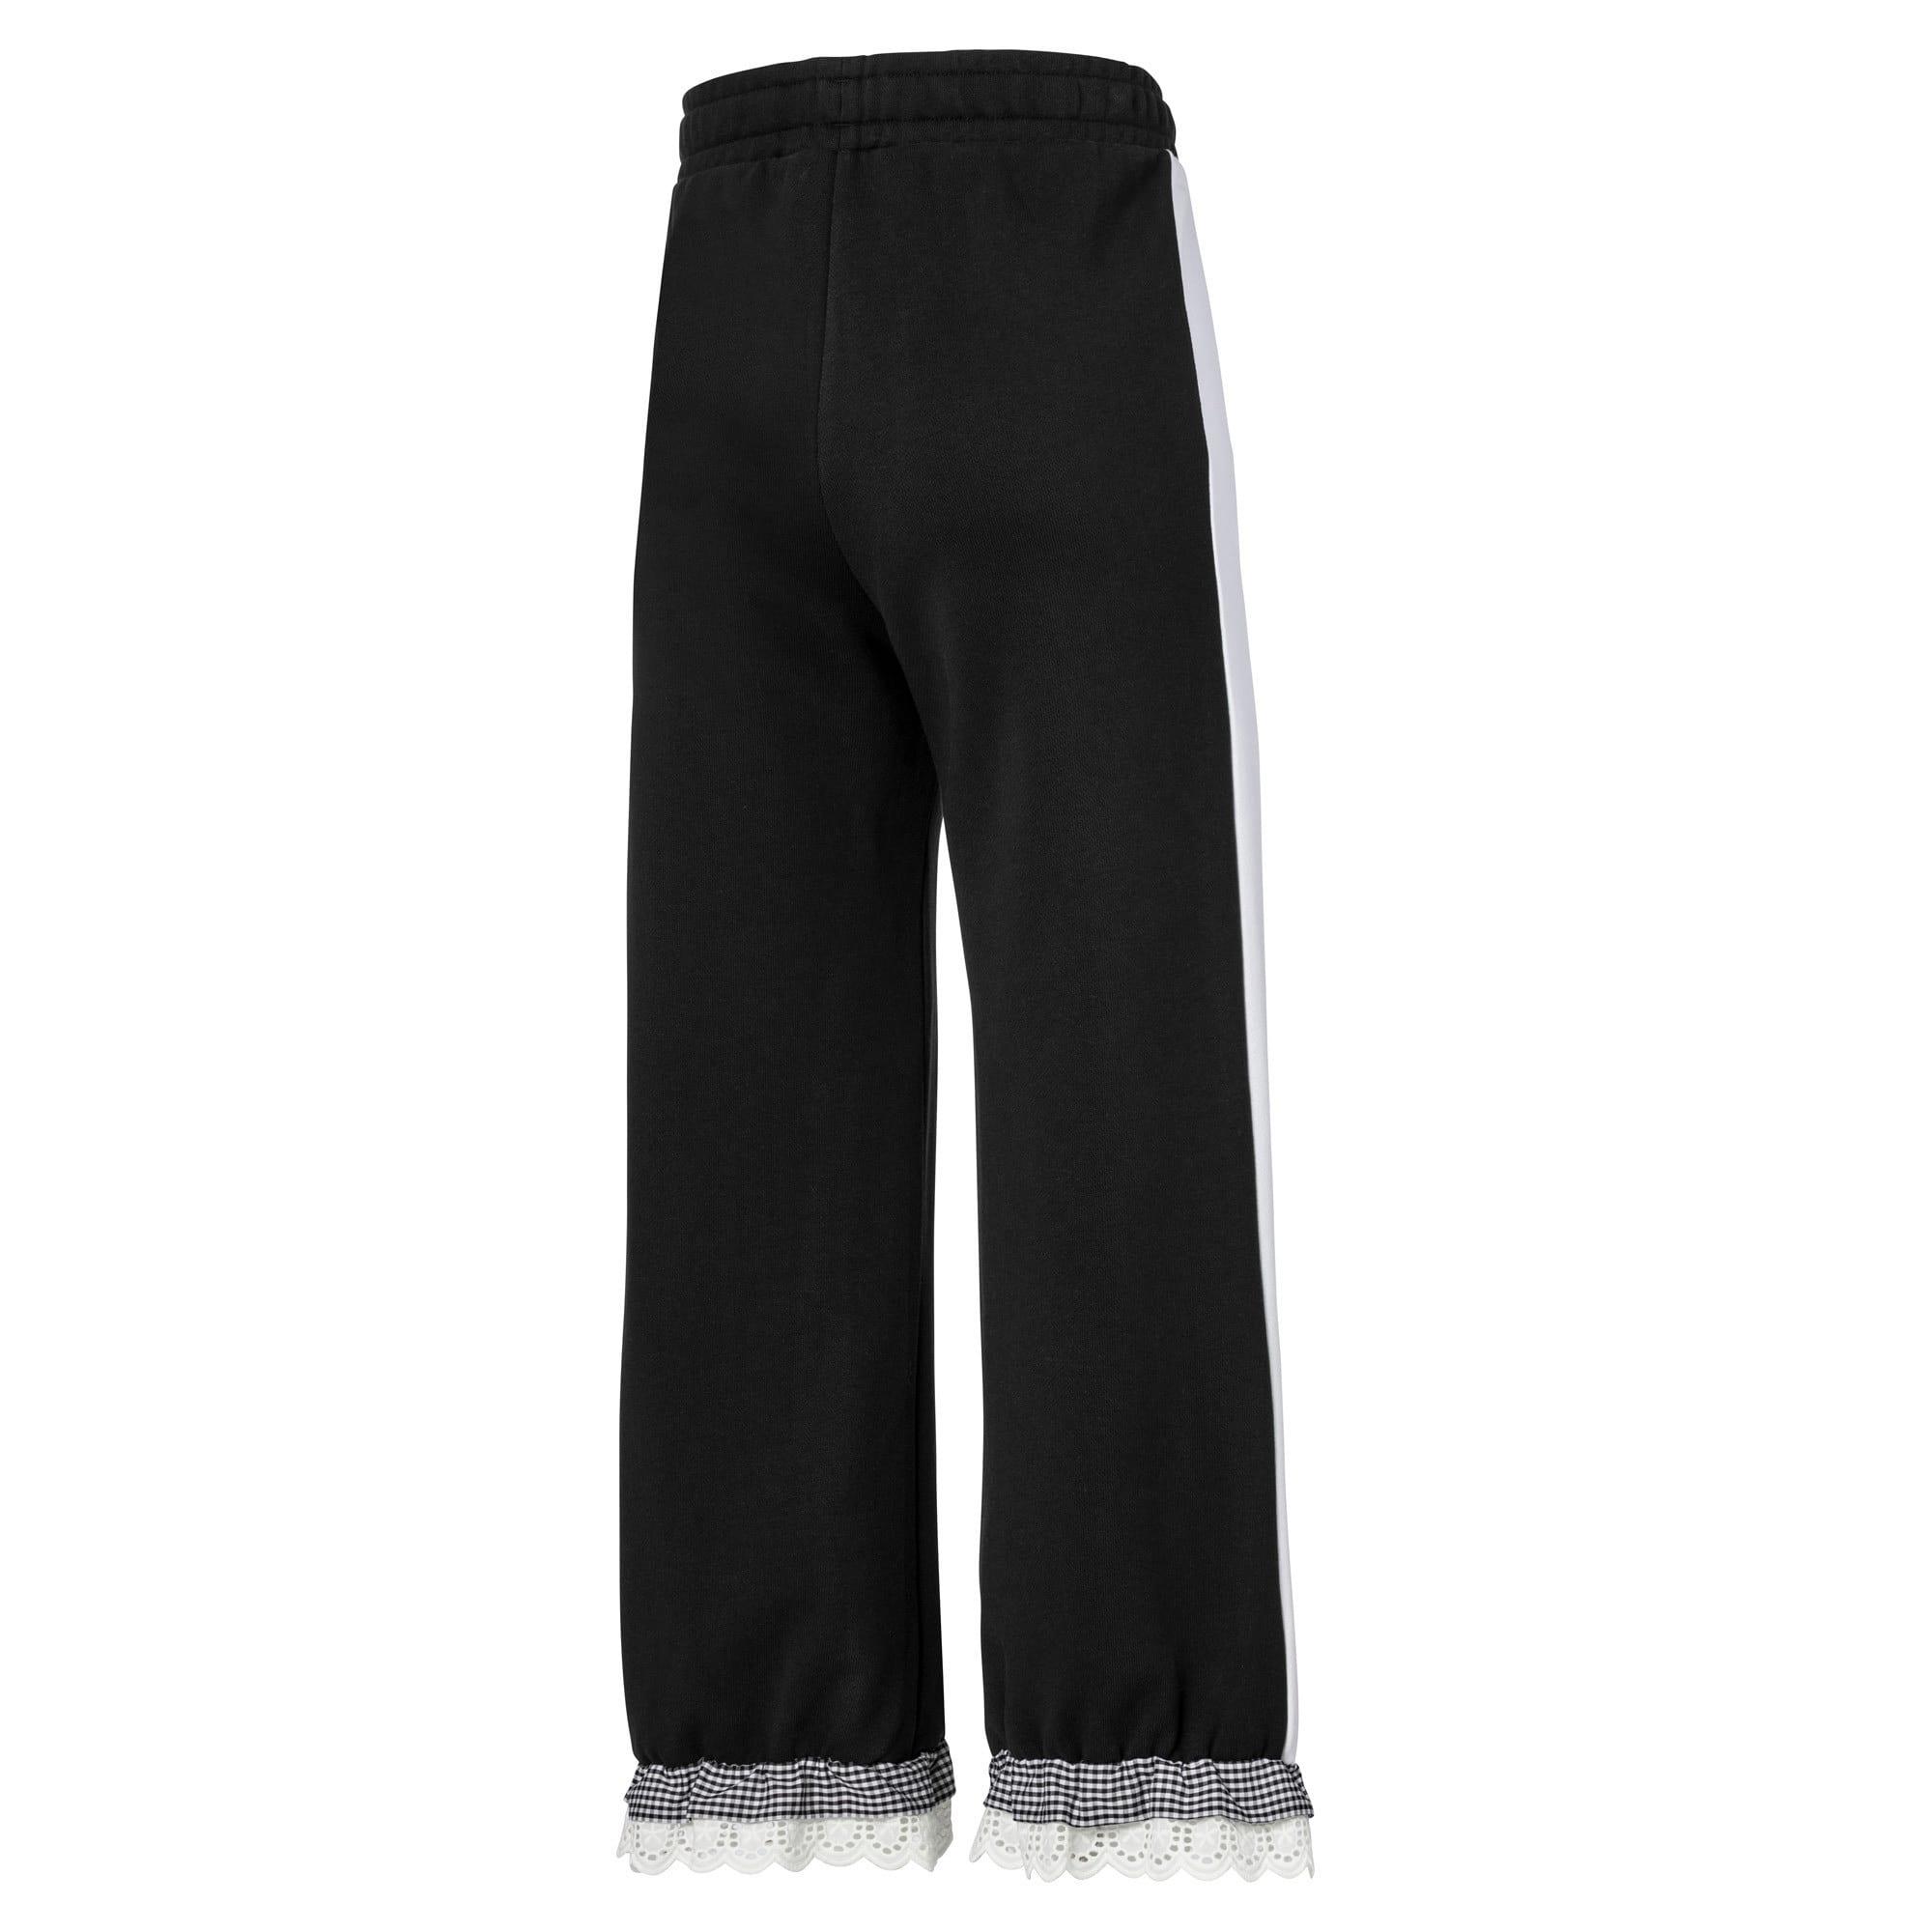 Thumbnail 5 of PUMA x TYAKASHA Women's Culottes, Cotton Black, medium